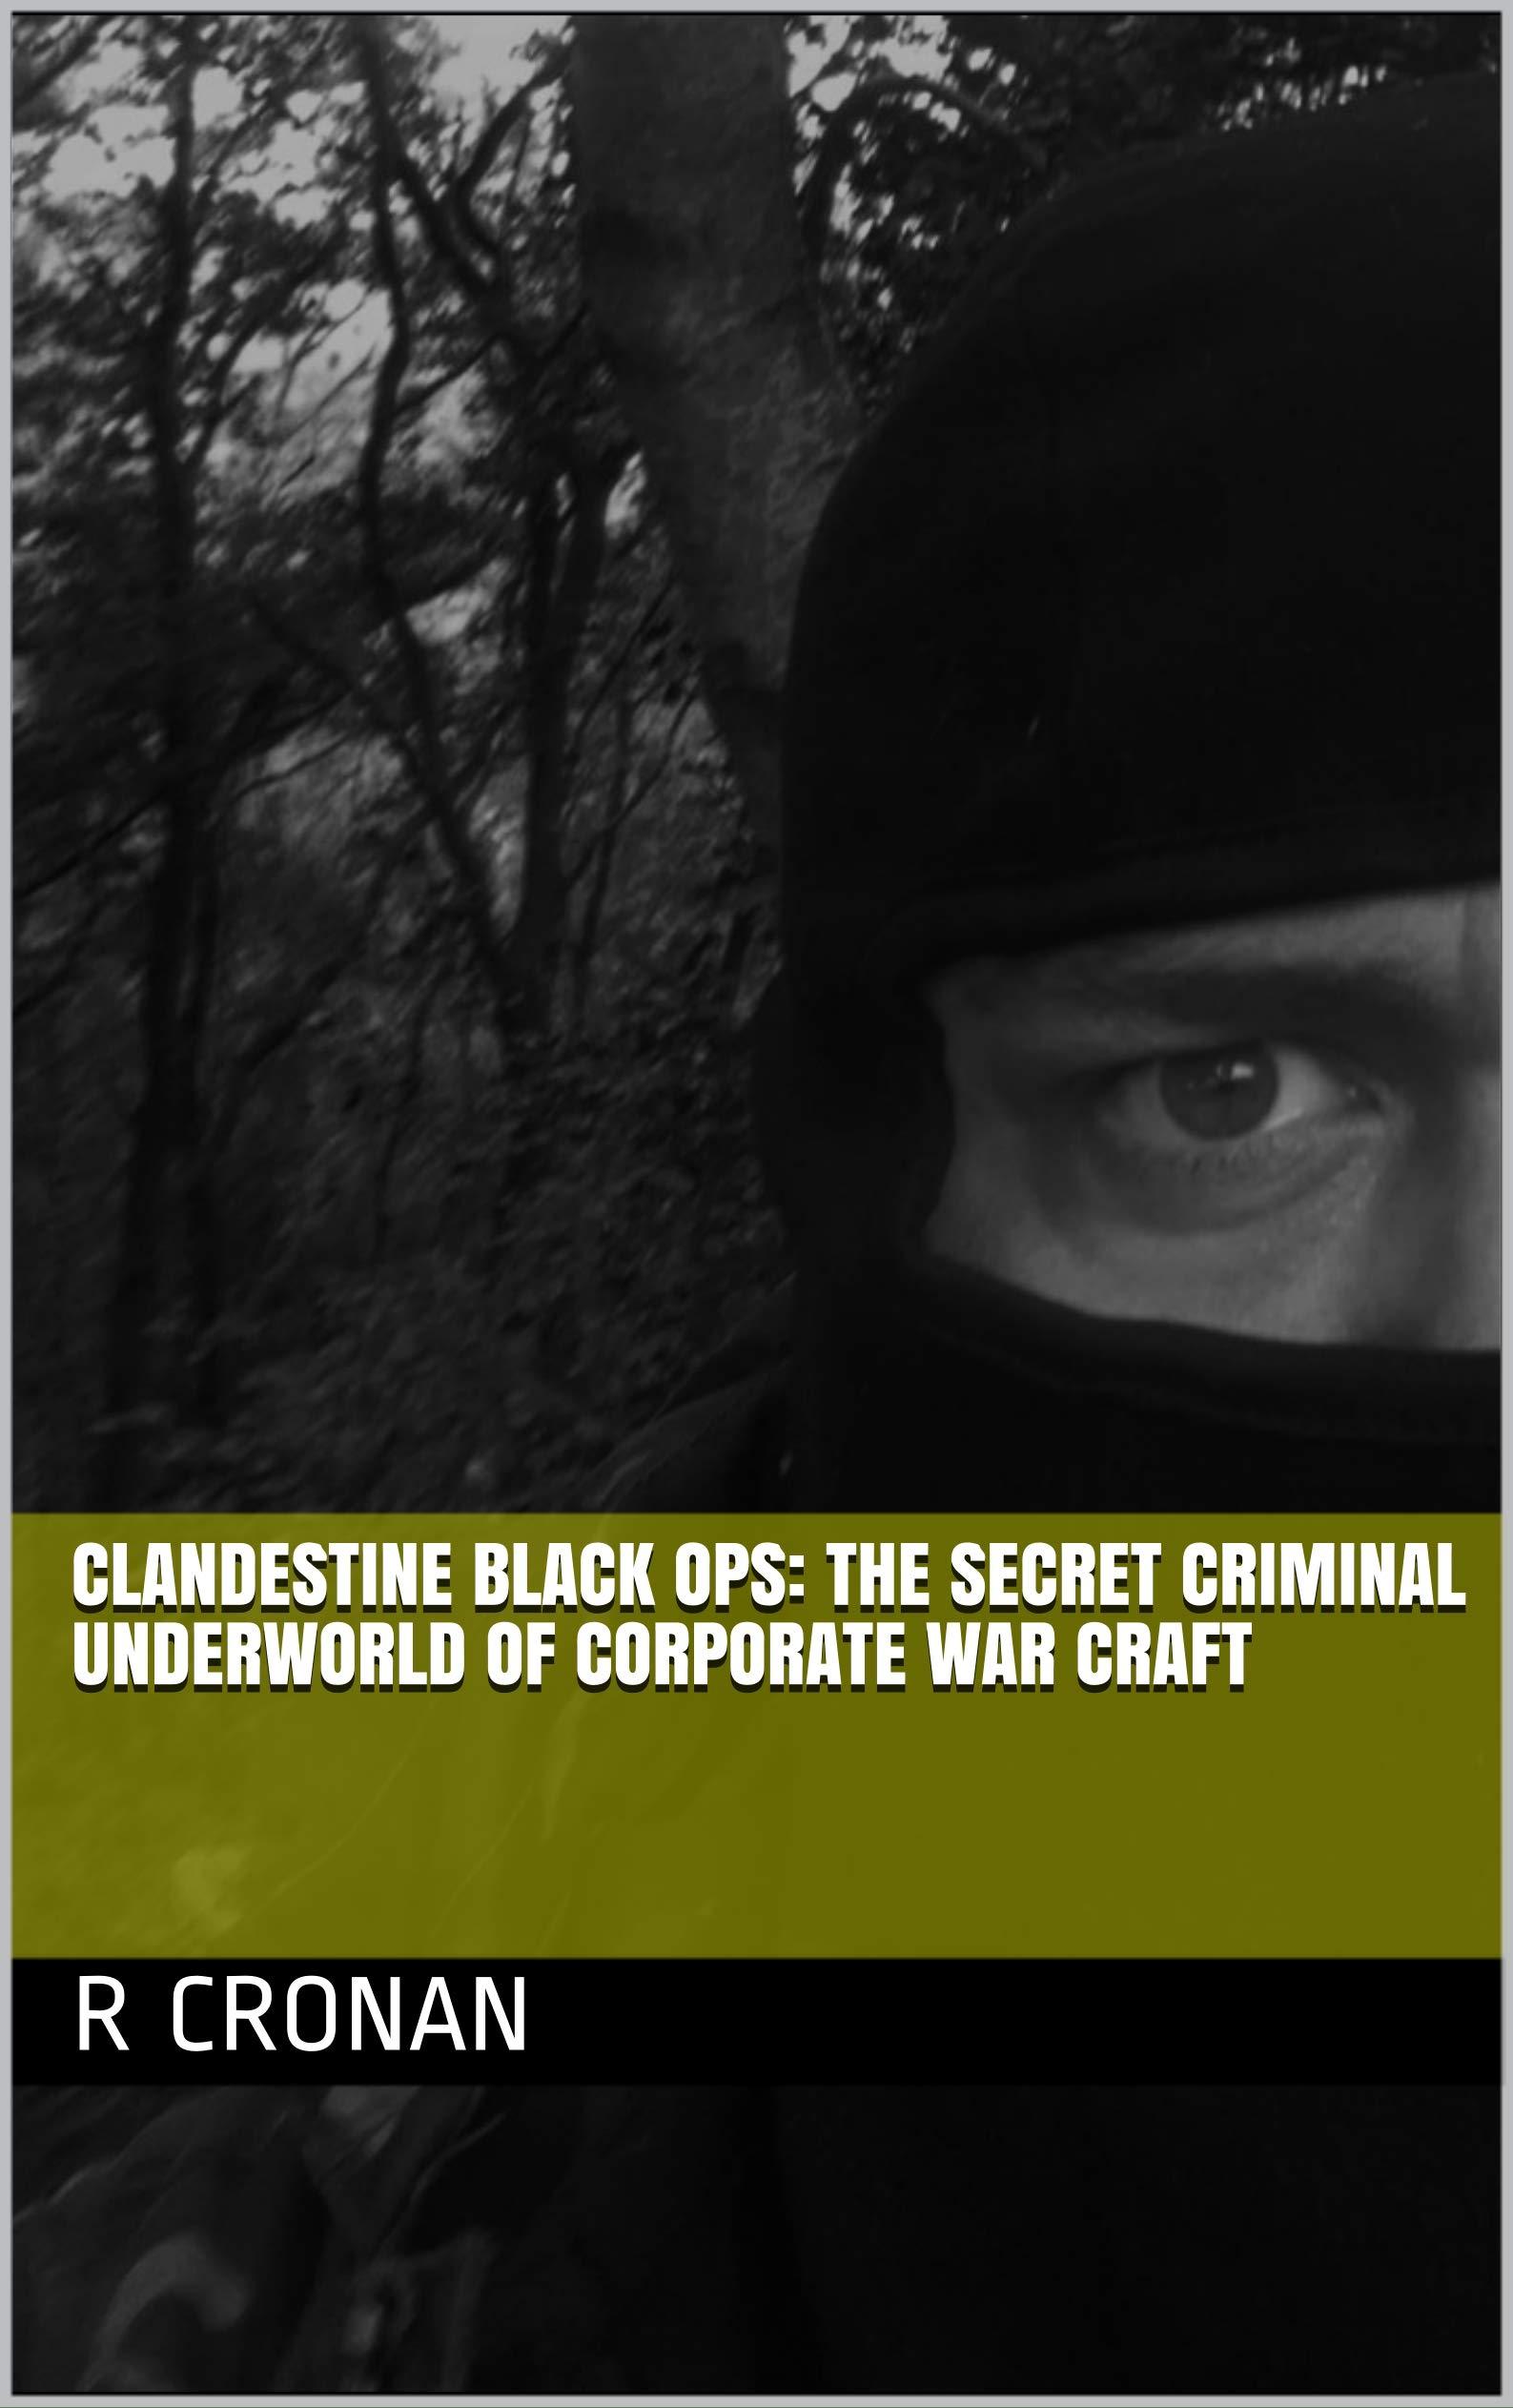 Clandestine Black Ops: The secret criminal underworld of corporate war craft